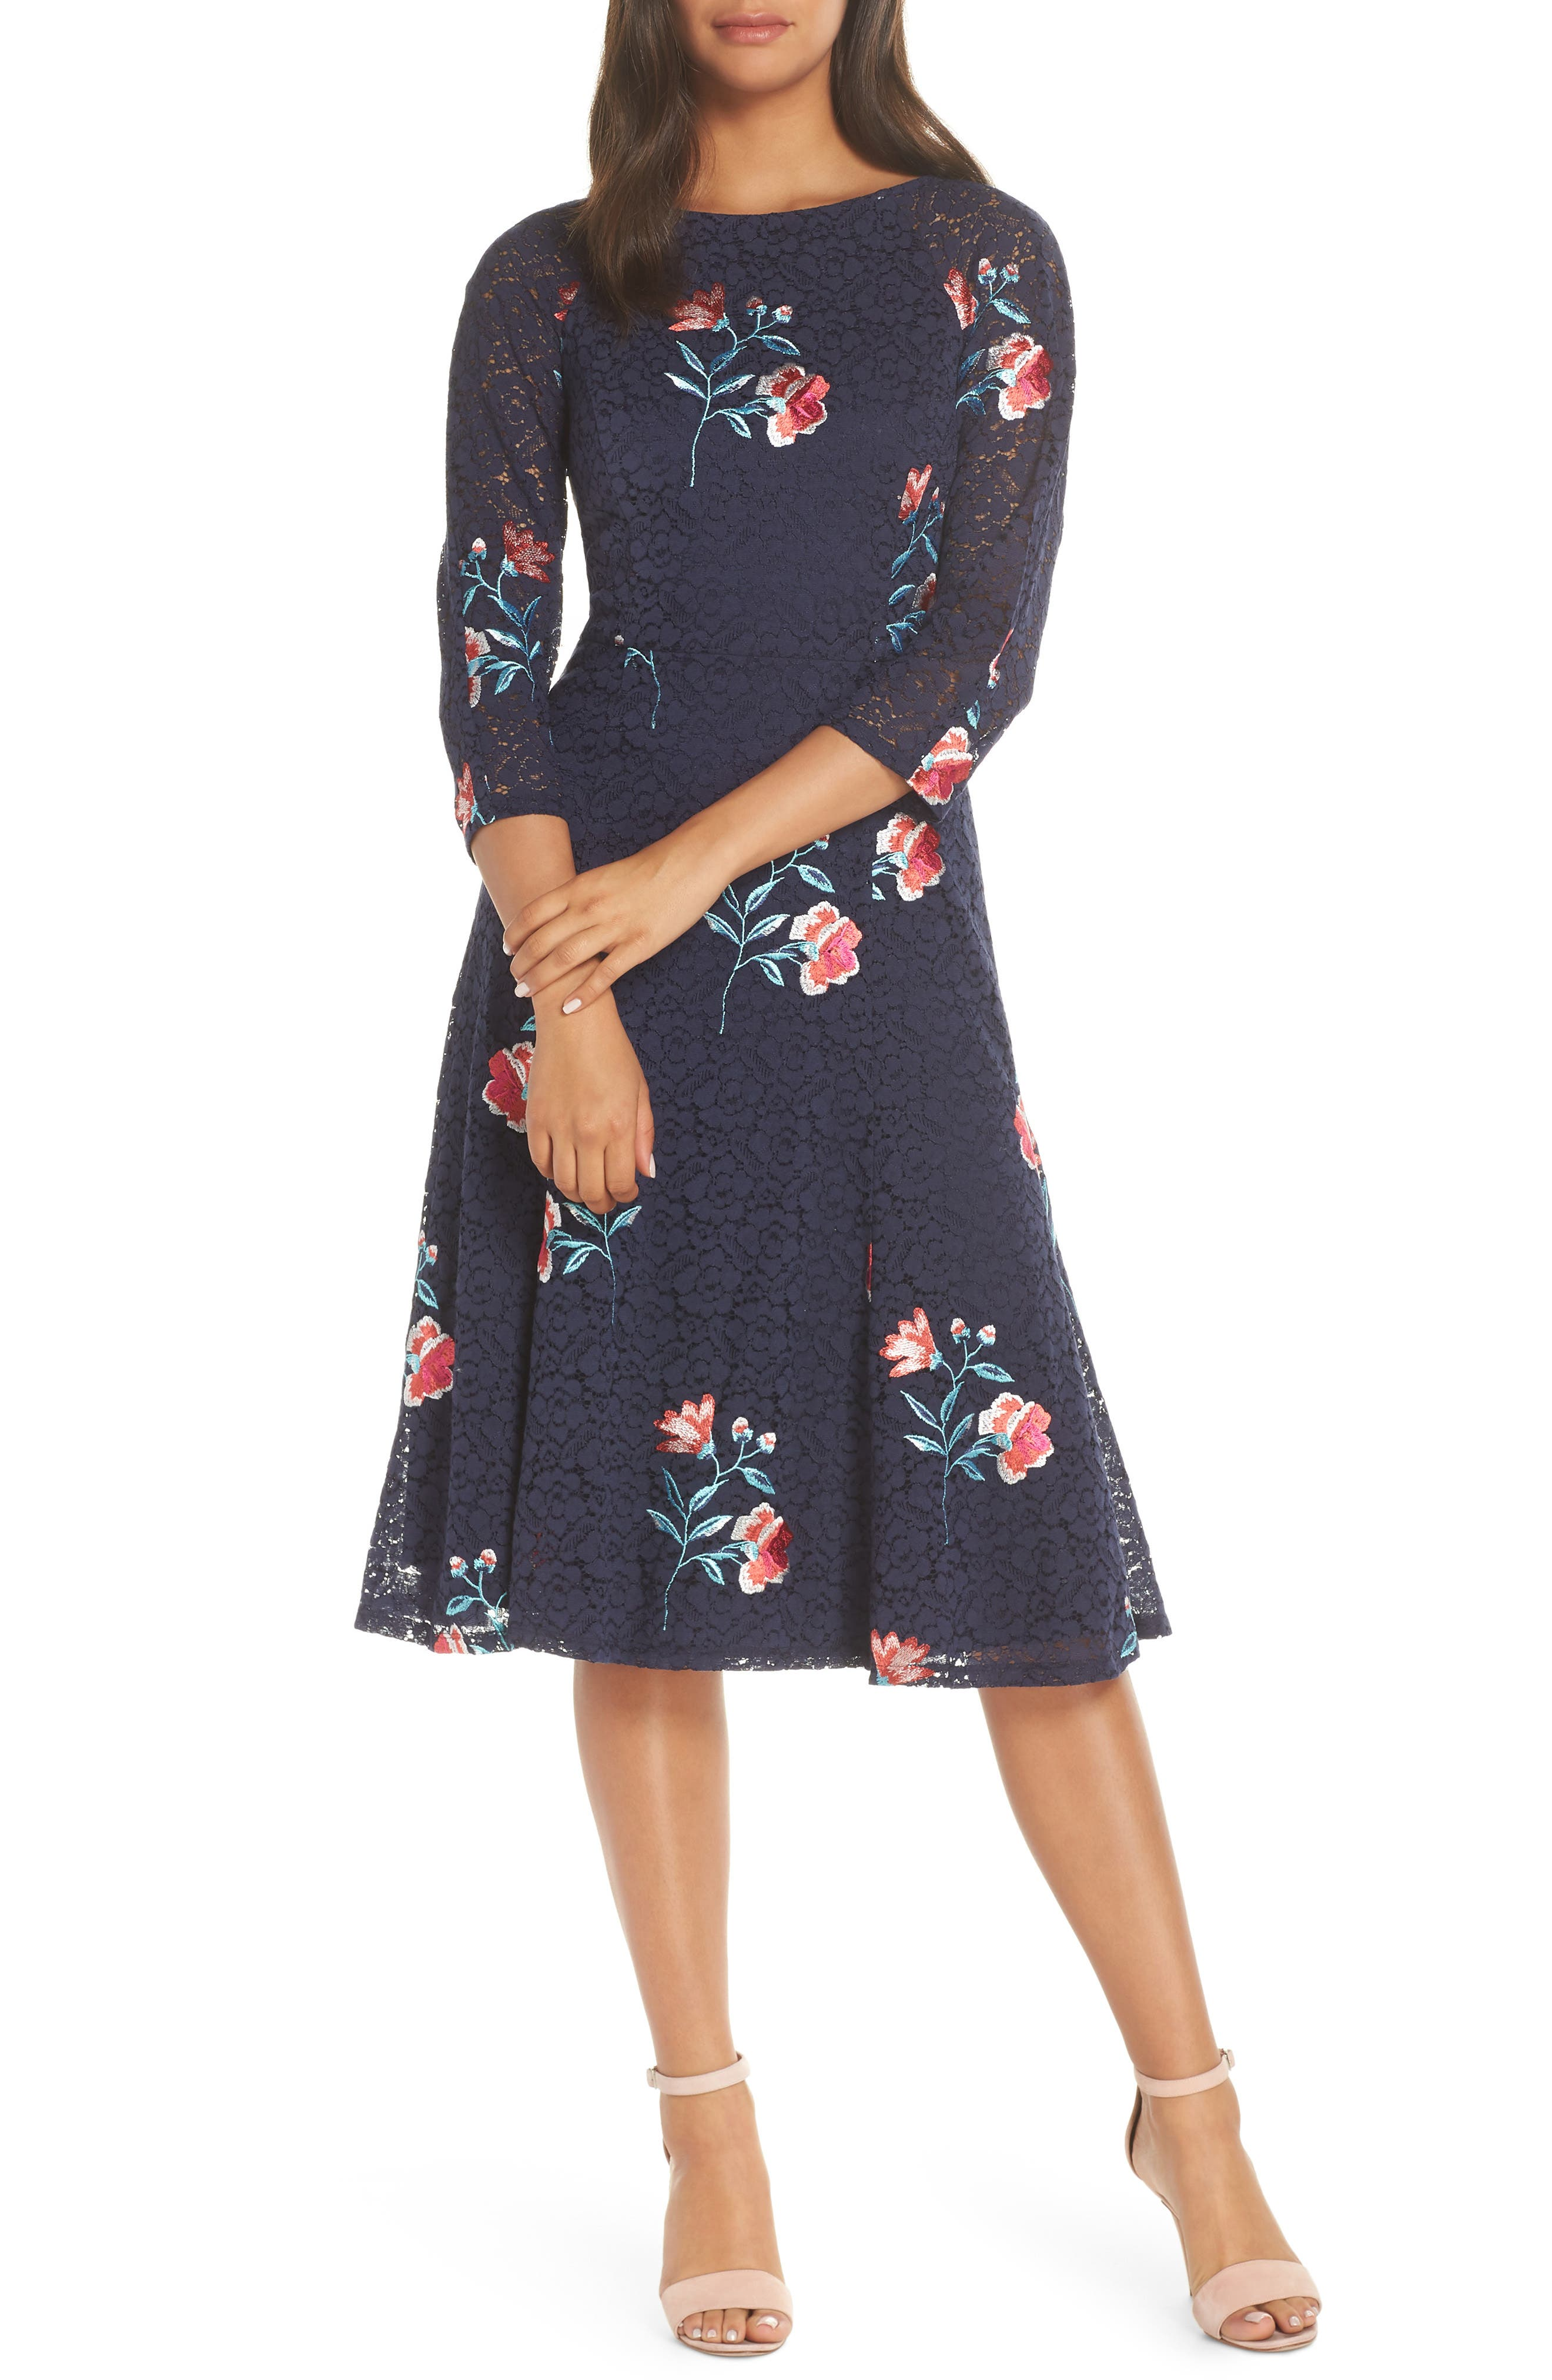 ELIZA J, Embroidery & Lace A-Line Dress, Main thumbnail 1, color, NAVY